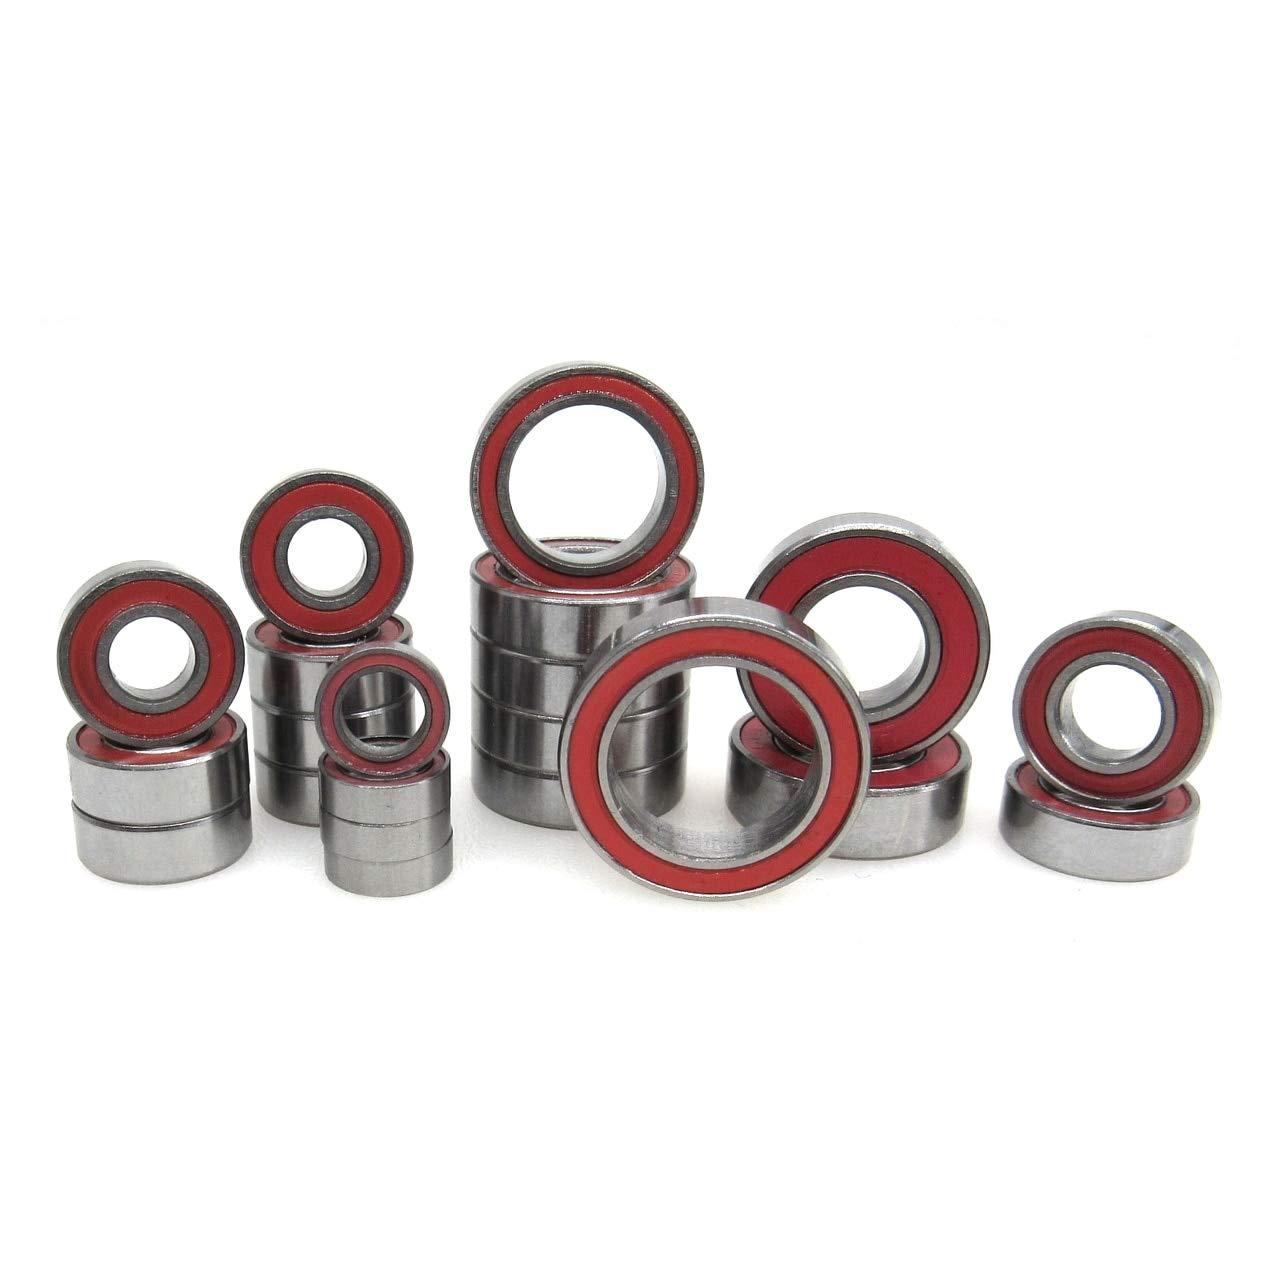 TRB RC Ceramic Ball Bearing Kit (21) Traxxas Slash Rustler 4x4 VXL